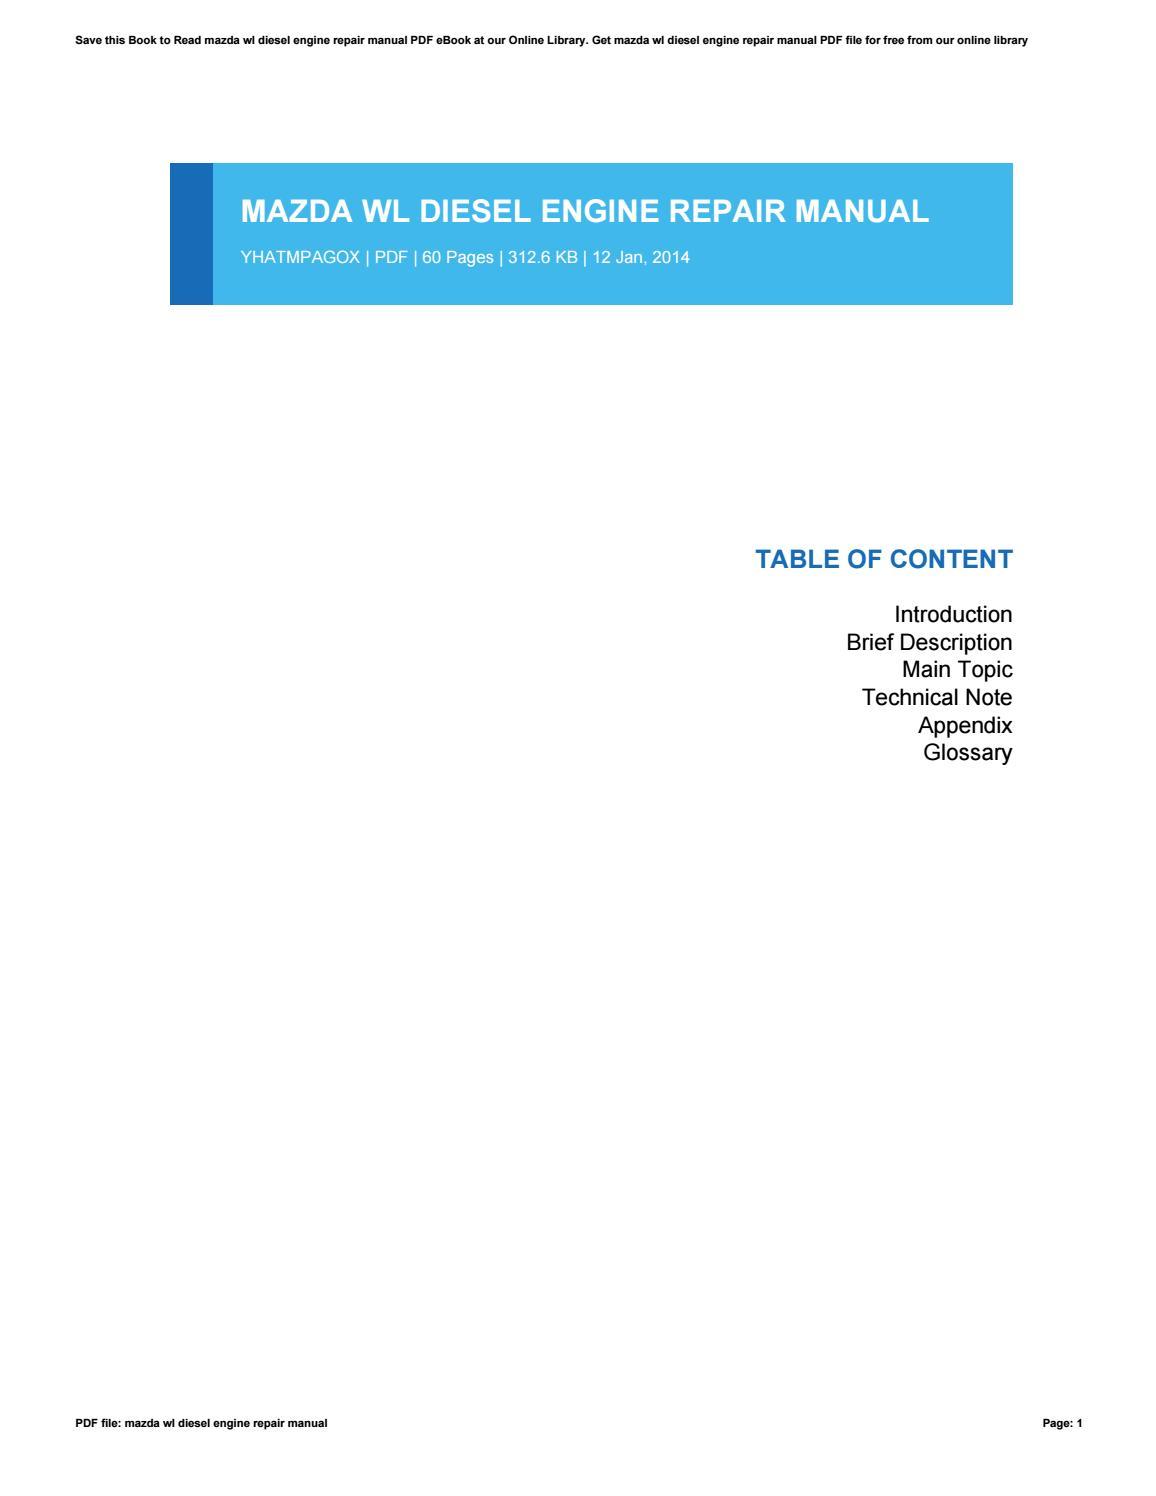 hight resolution of mazda wl engine timing mark diagram